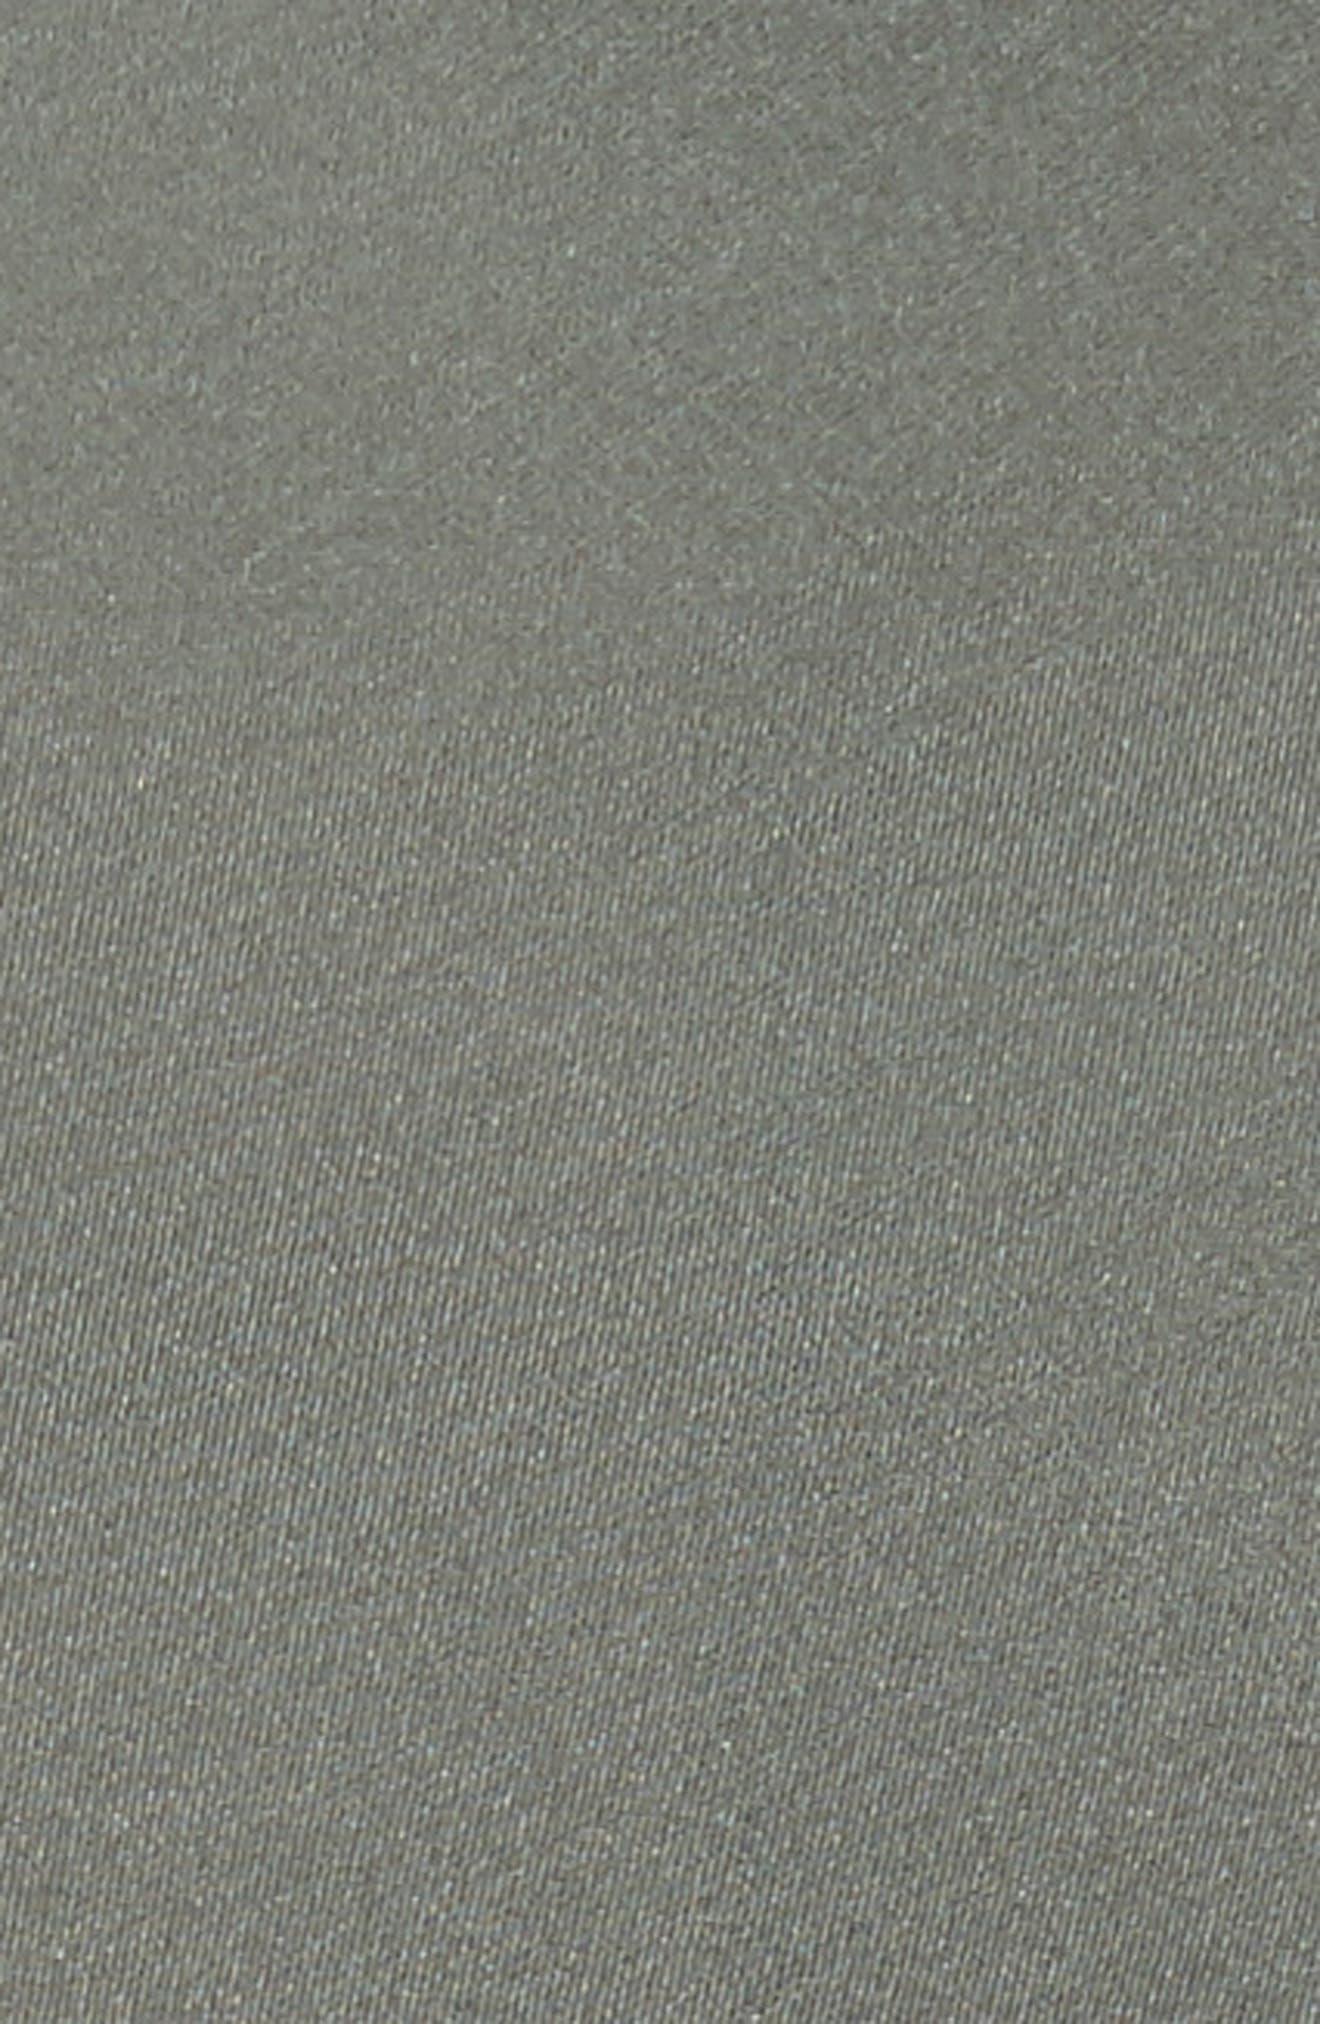 Silk Chiffon Midi Skirt,                             Alternate thumbnail 5, color,                             300